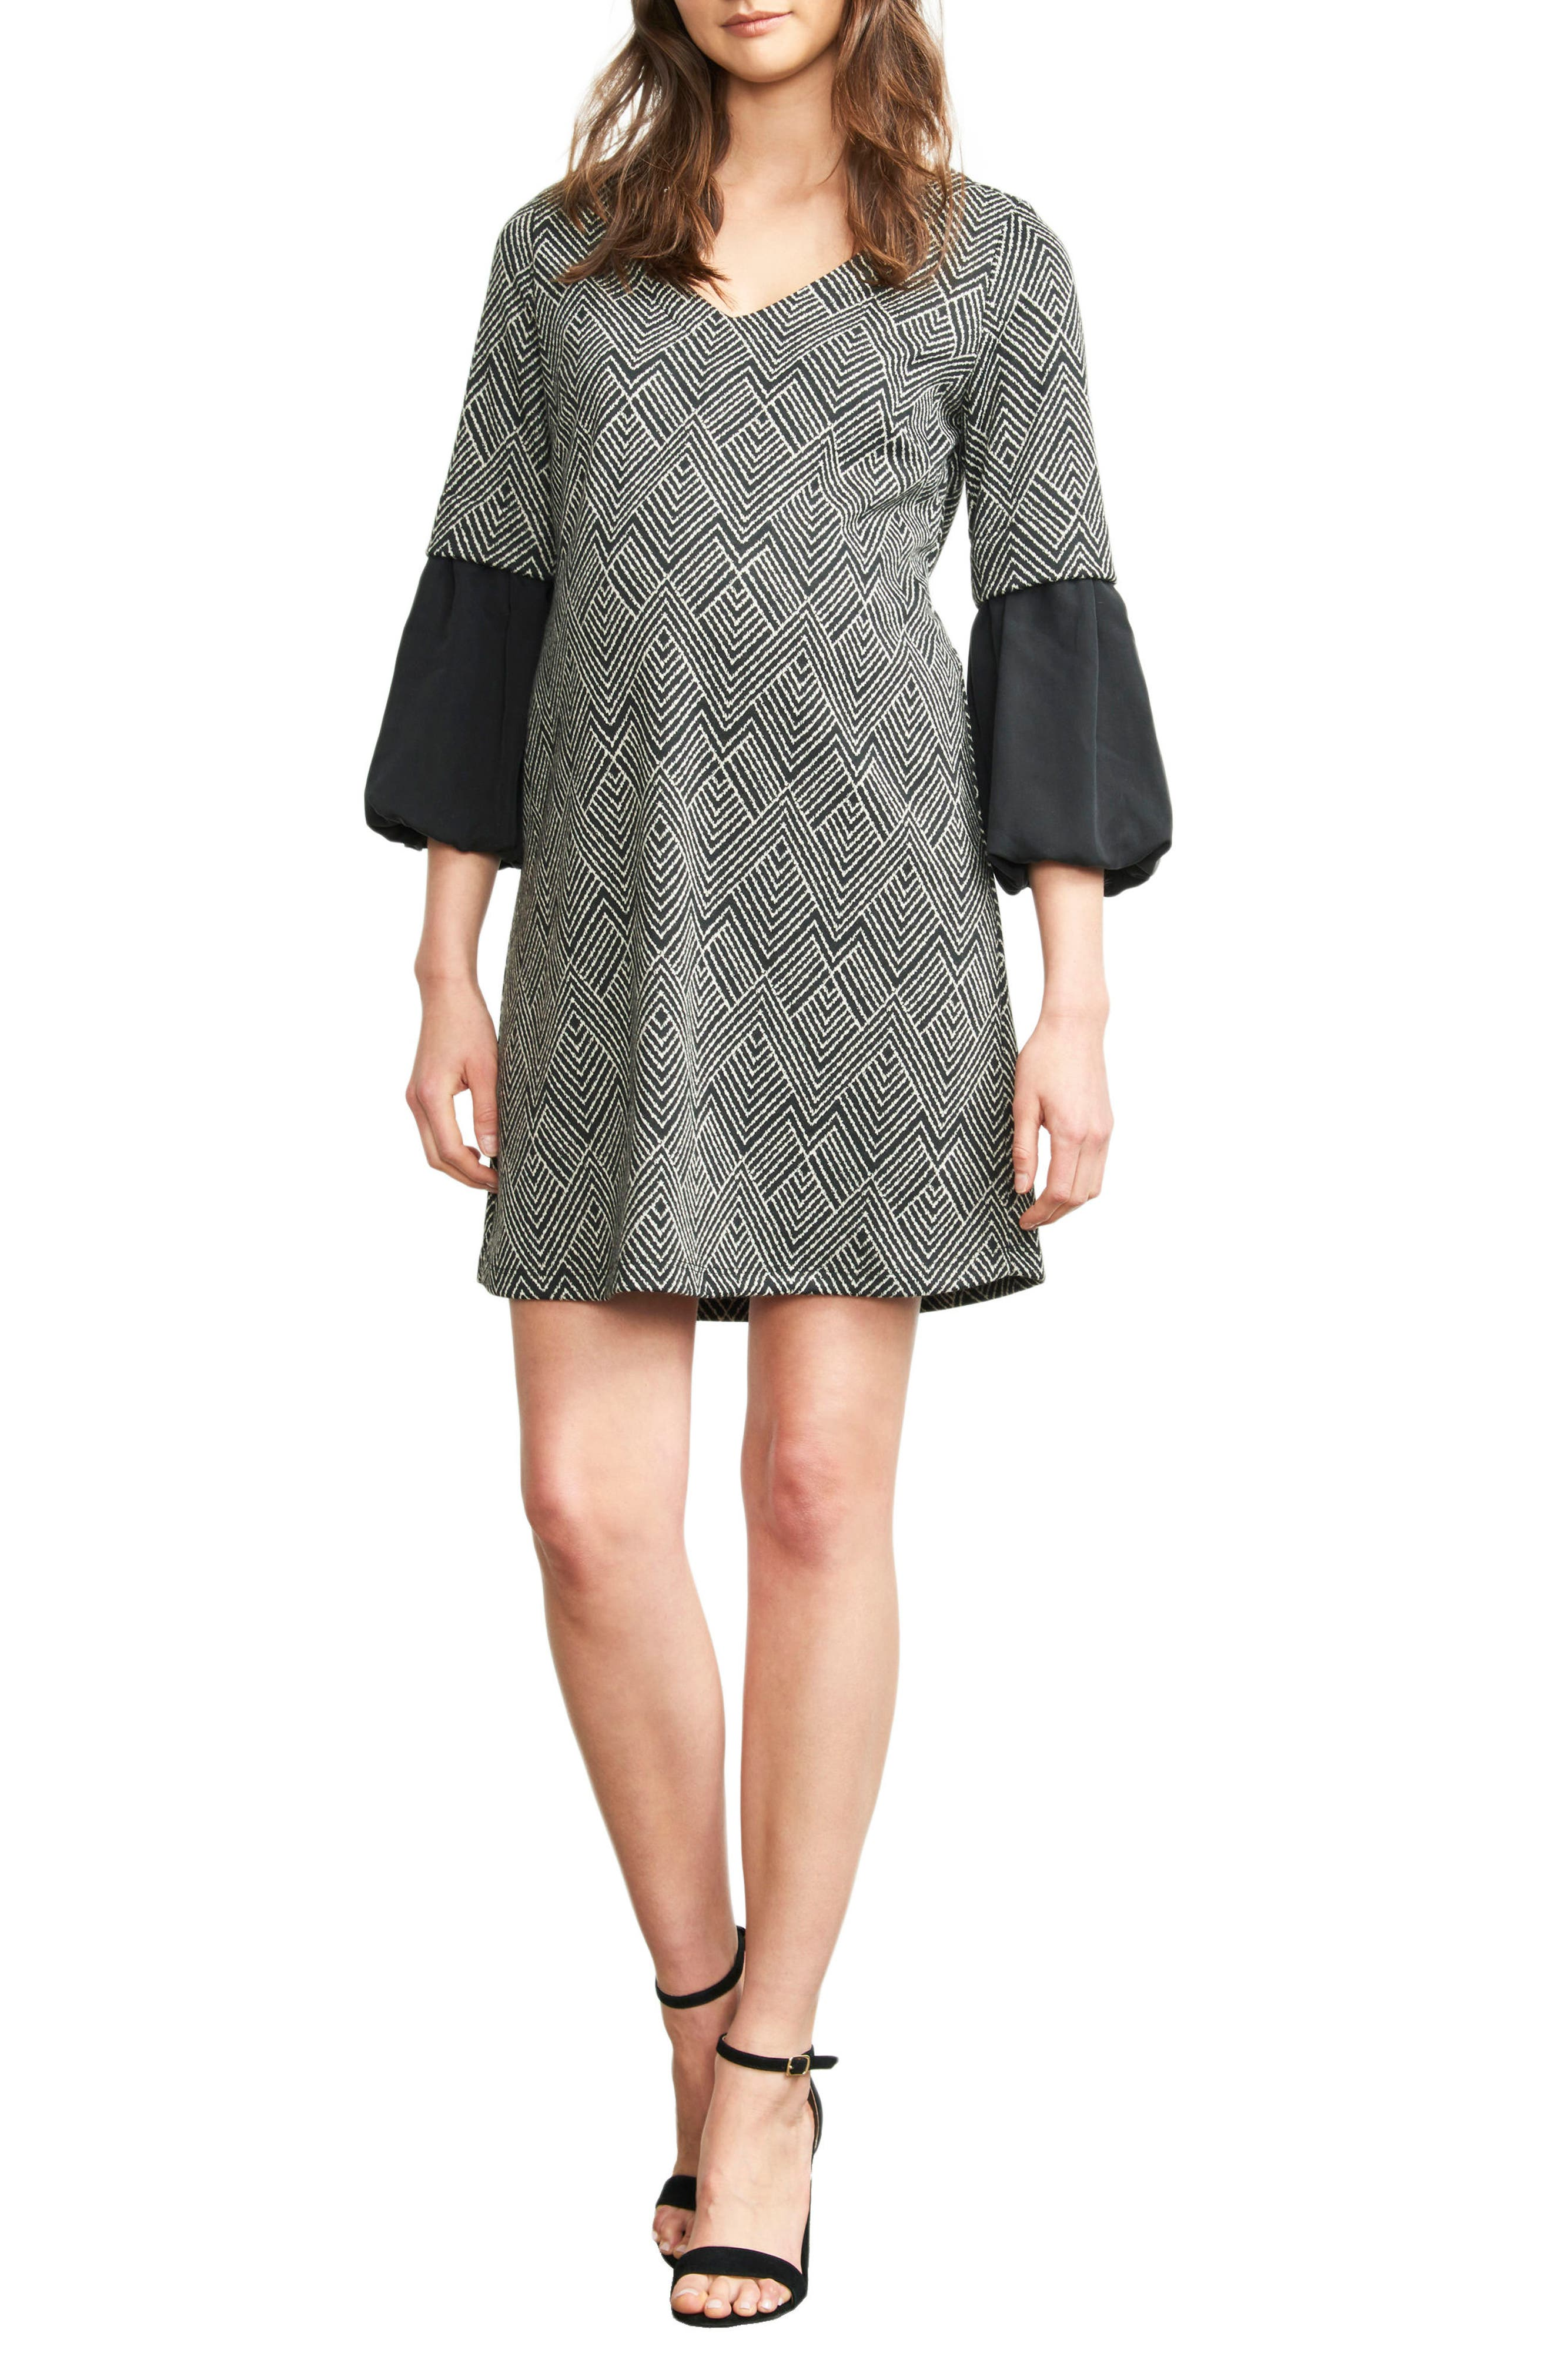 Print Bell Sleeve Maternity Dress,                             Main thumbnail 1, color,                             BLACK/ IVORY DIAMOND